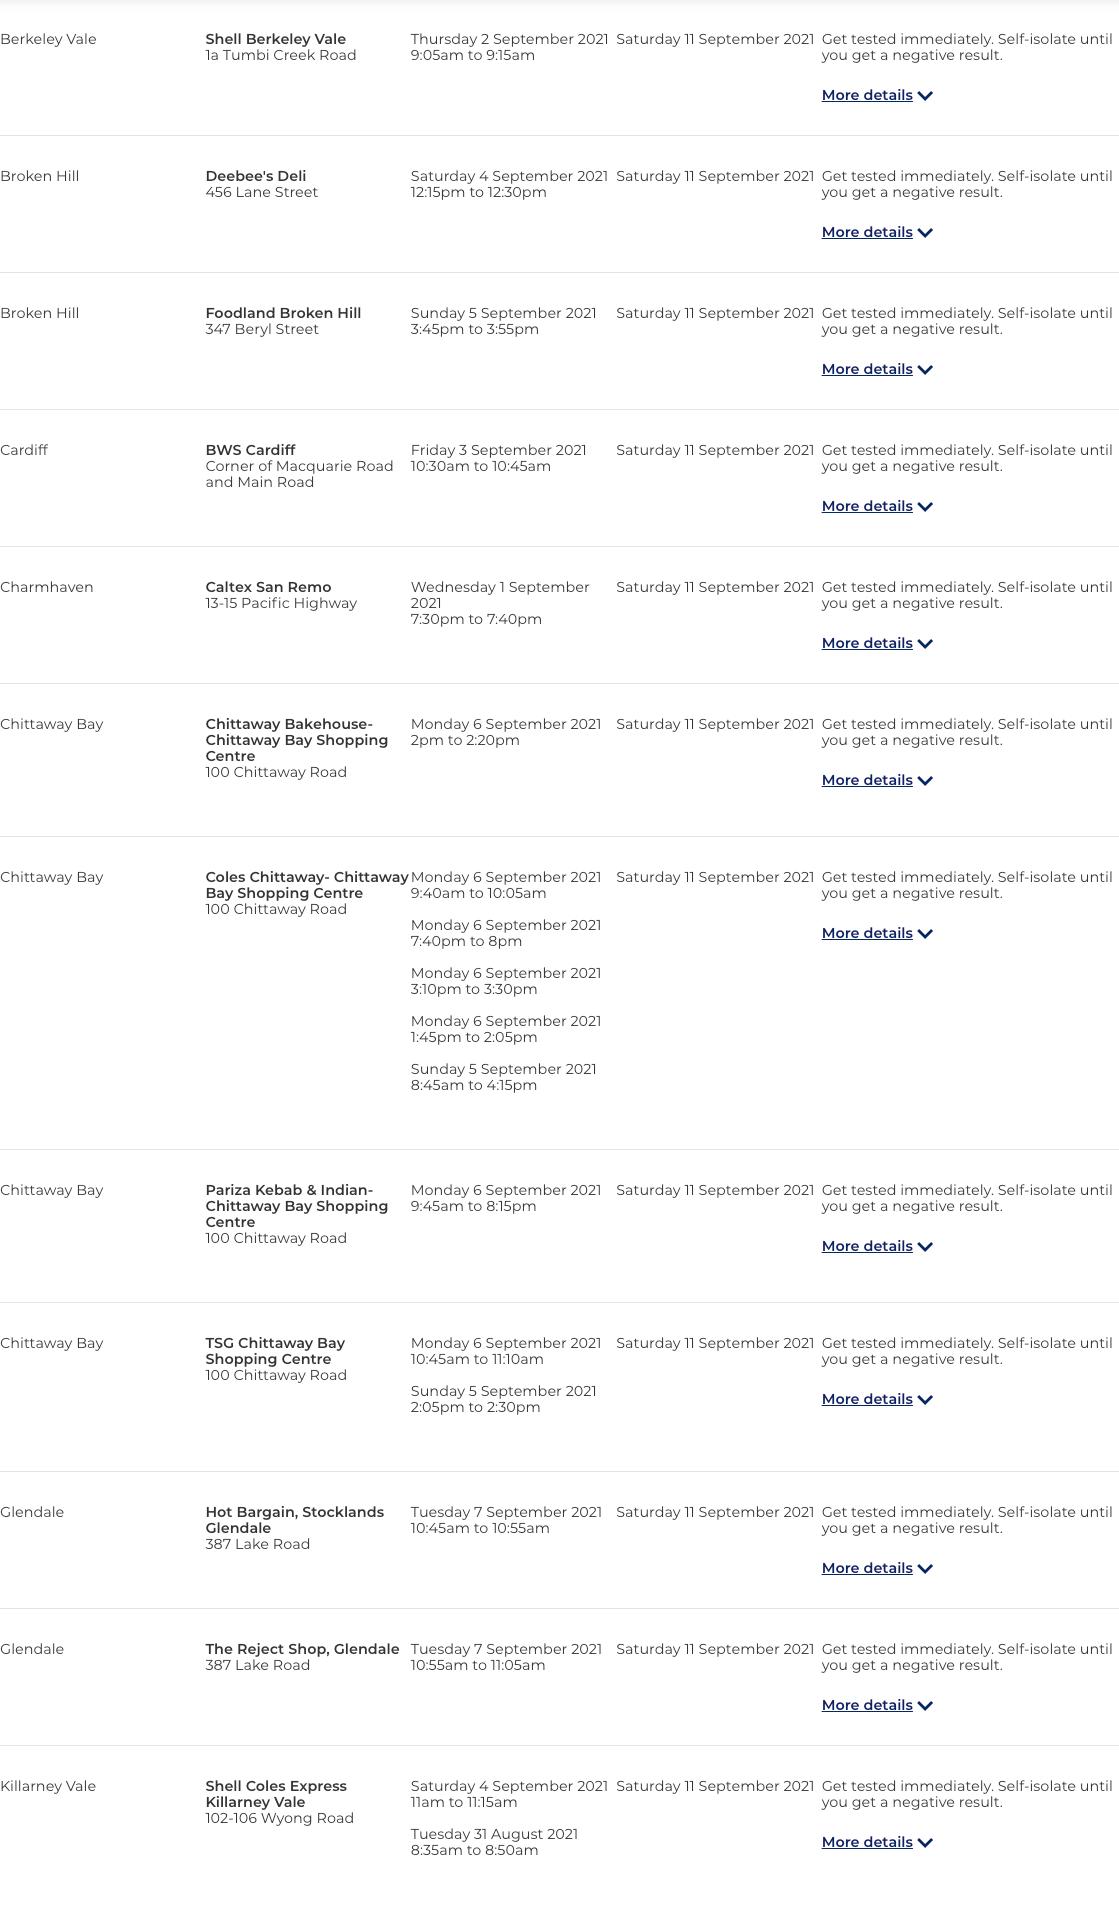 www.nsw.gov.au_covid-19_nsw-covid-19-case-locations_case-locations (25)的副本.png